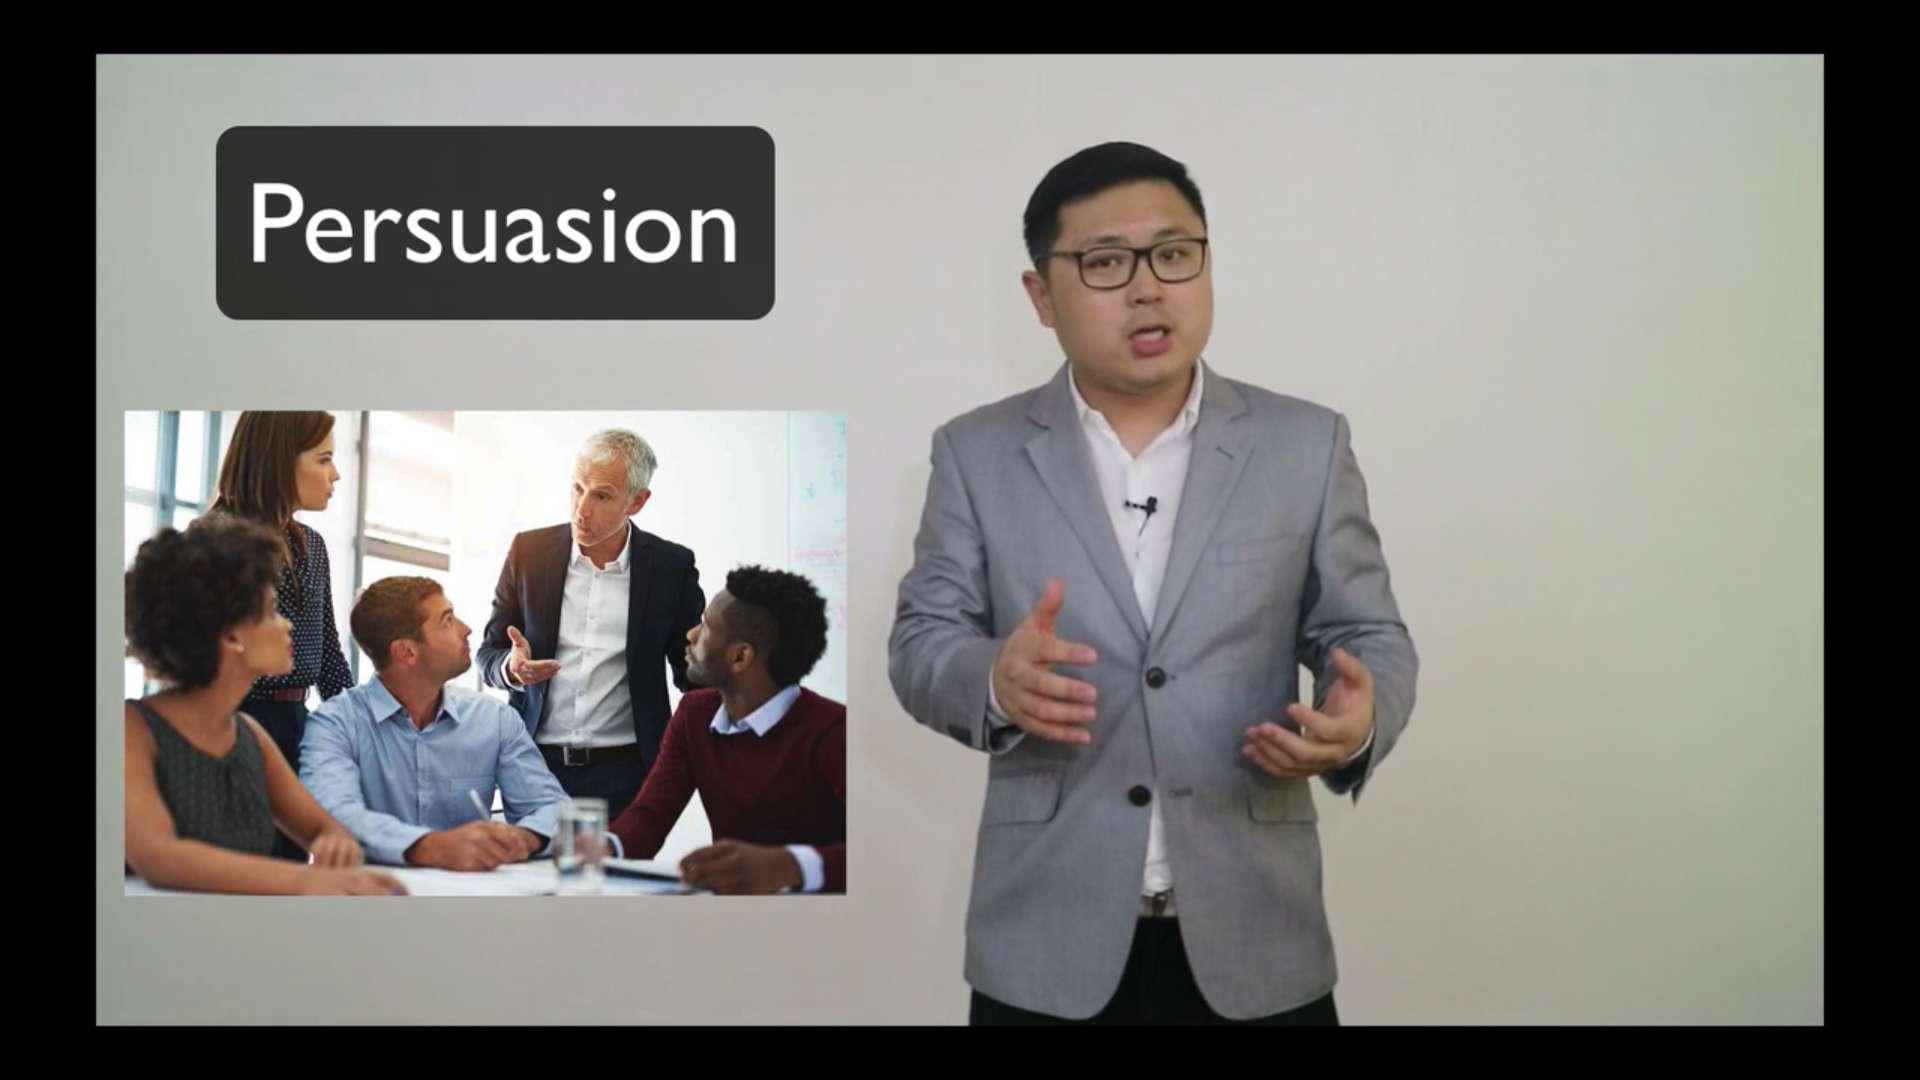 2. Presentation for Impact